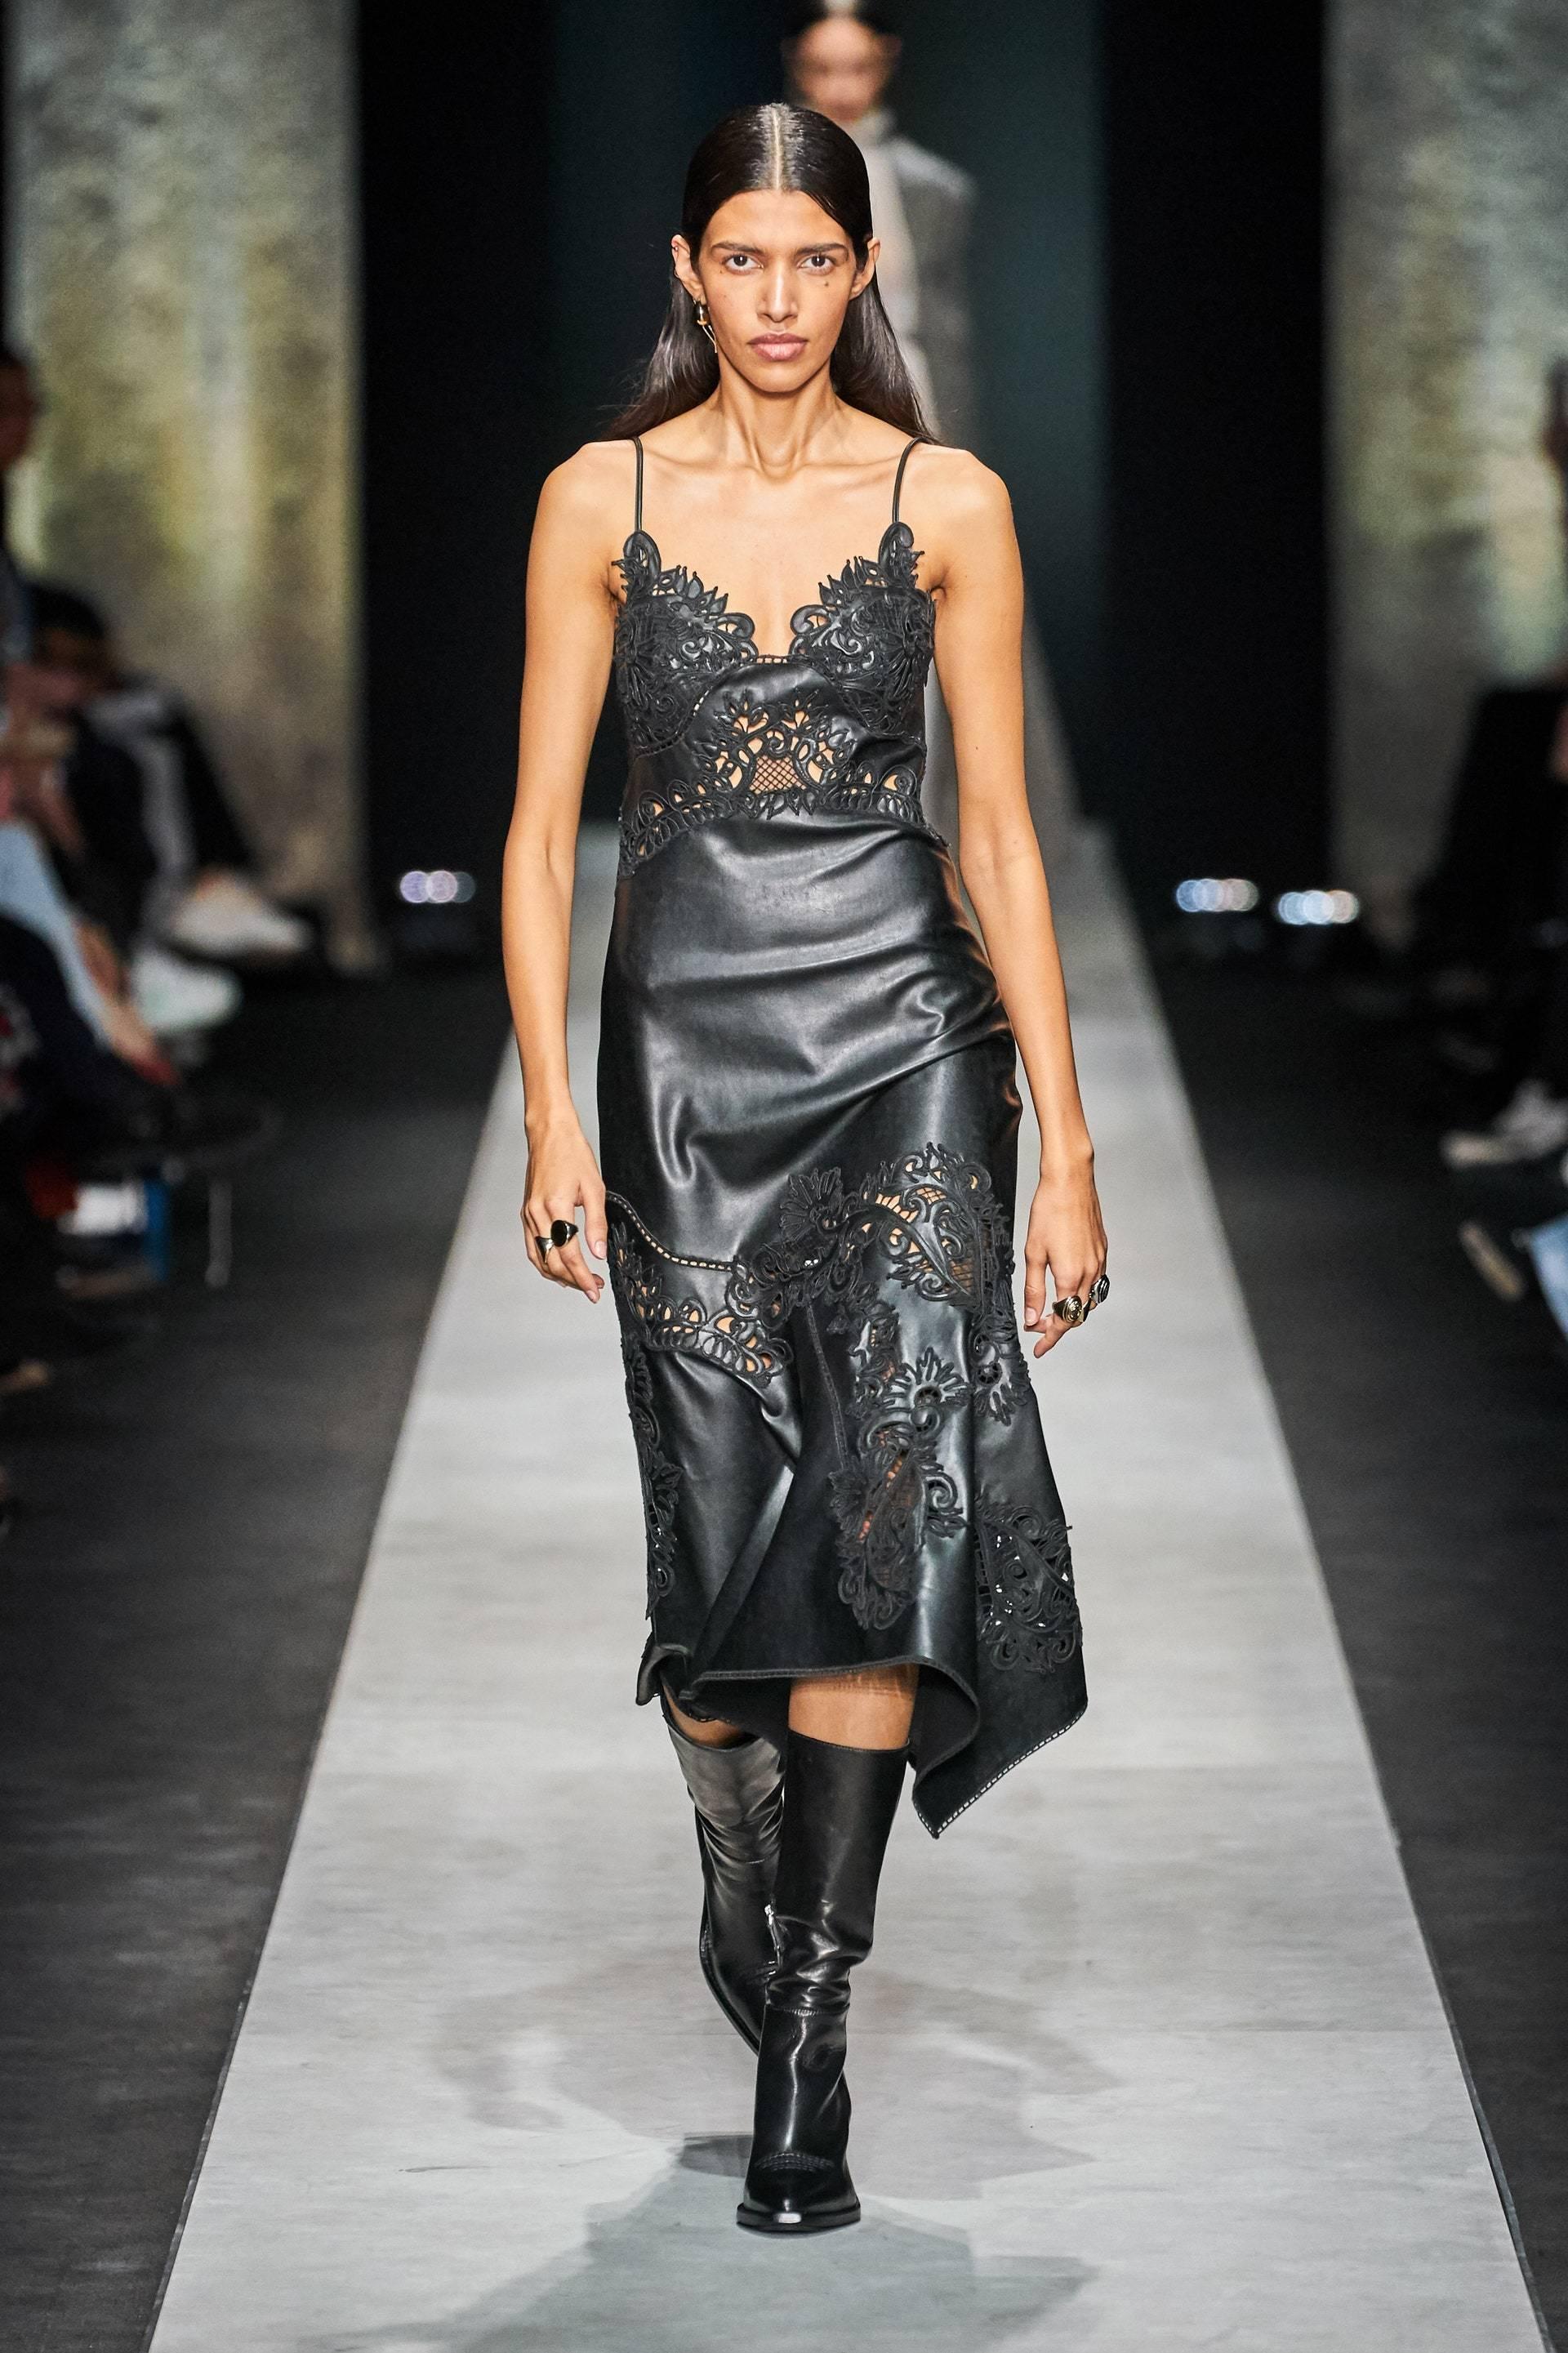 Vestido Ermanno Scervicino de Olivia Palermo